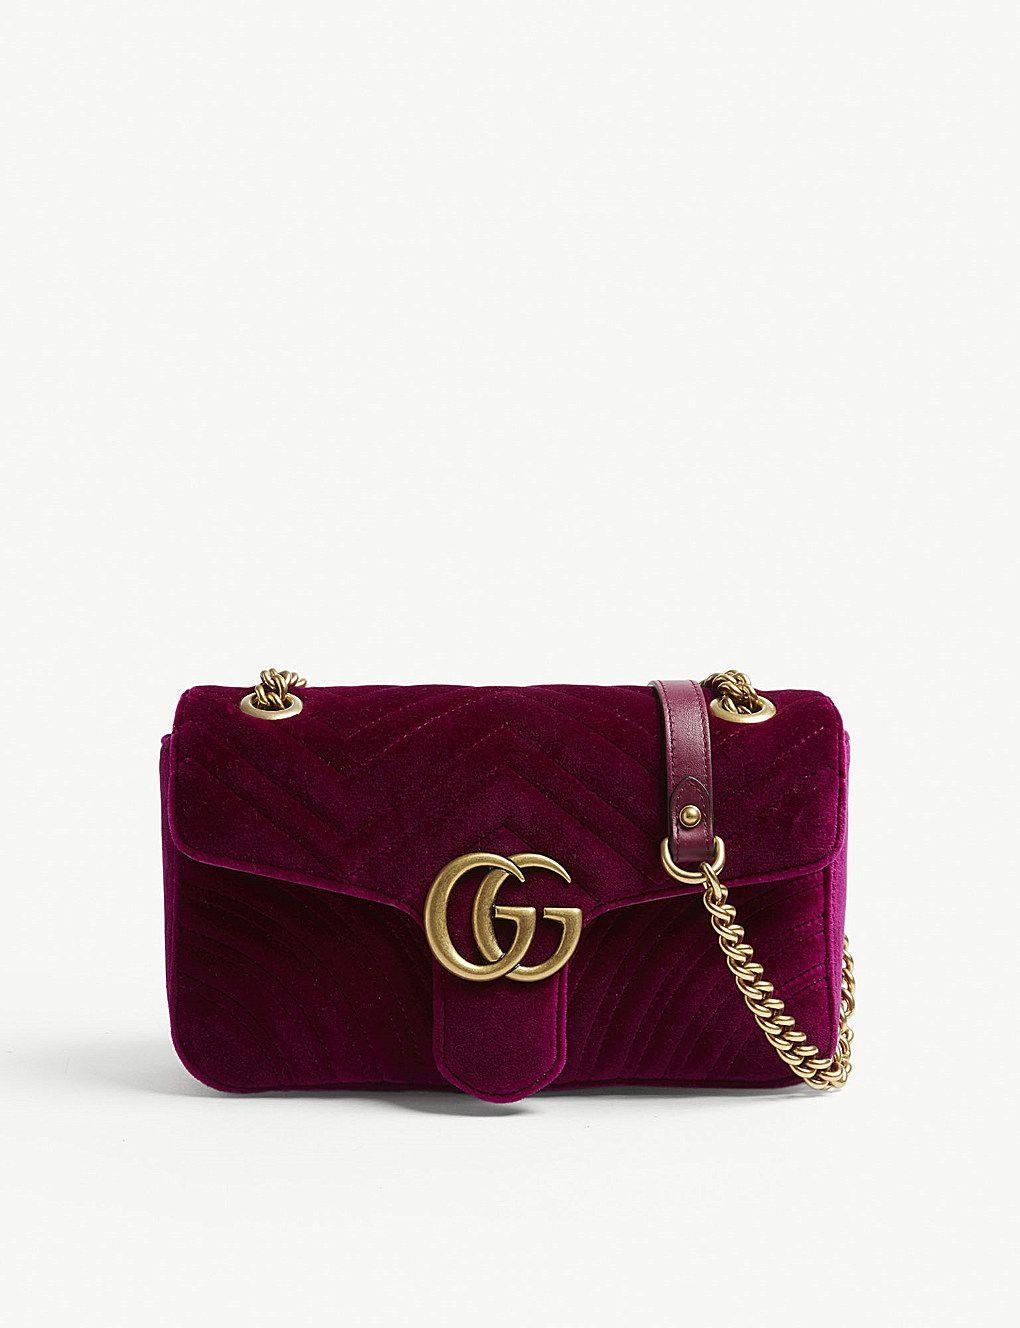 GUCCI - Marmont small velvet shoulder bag  b69d8c5a6c987